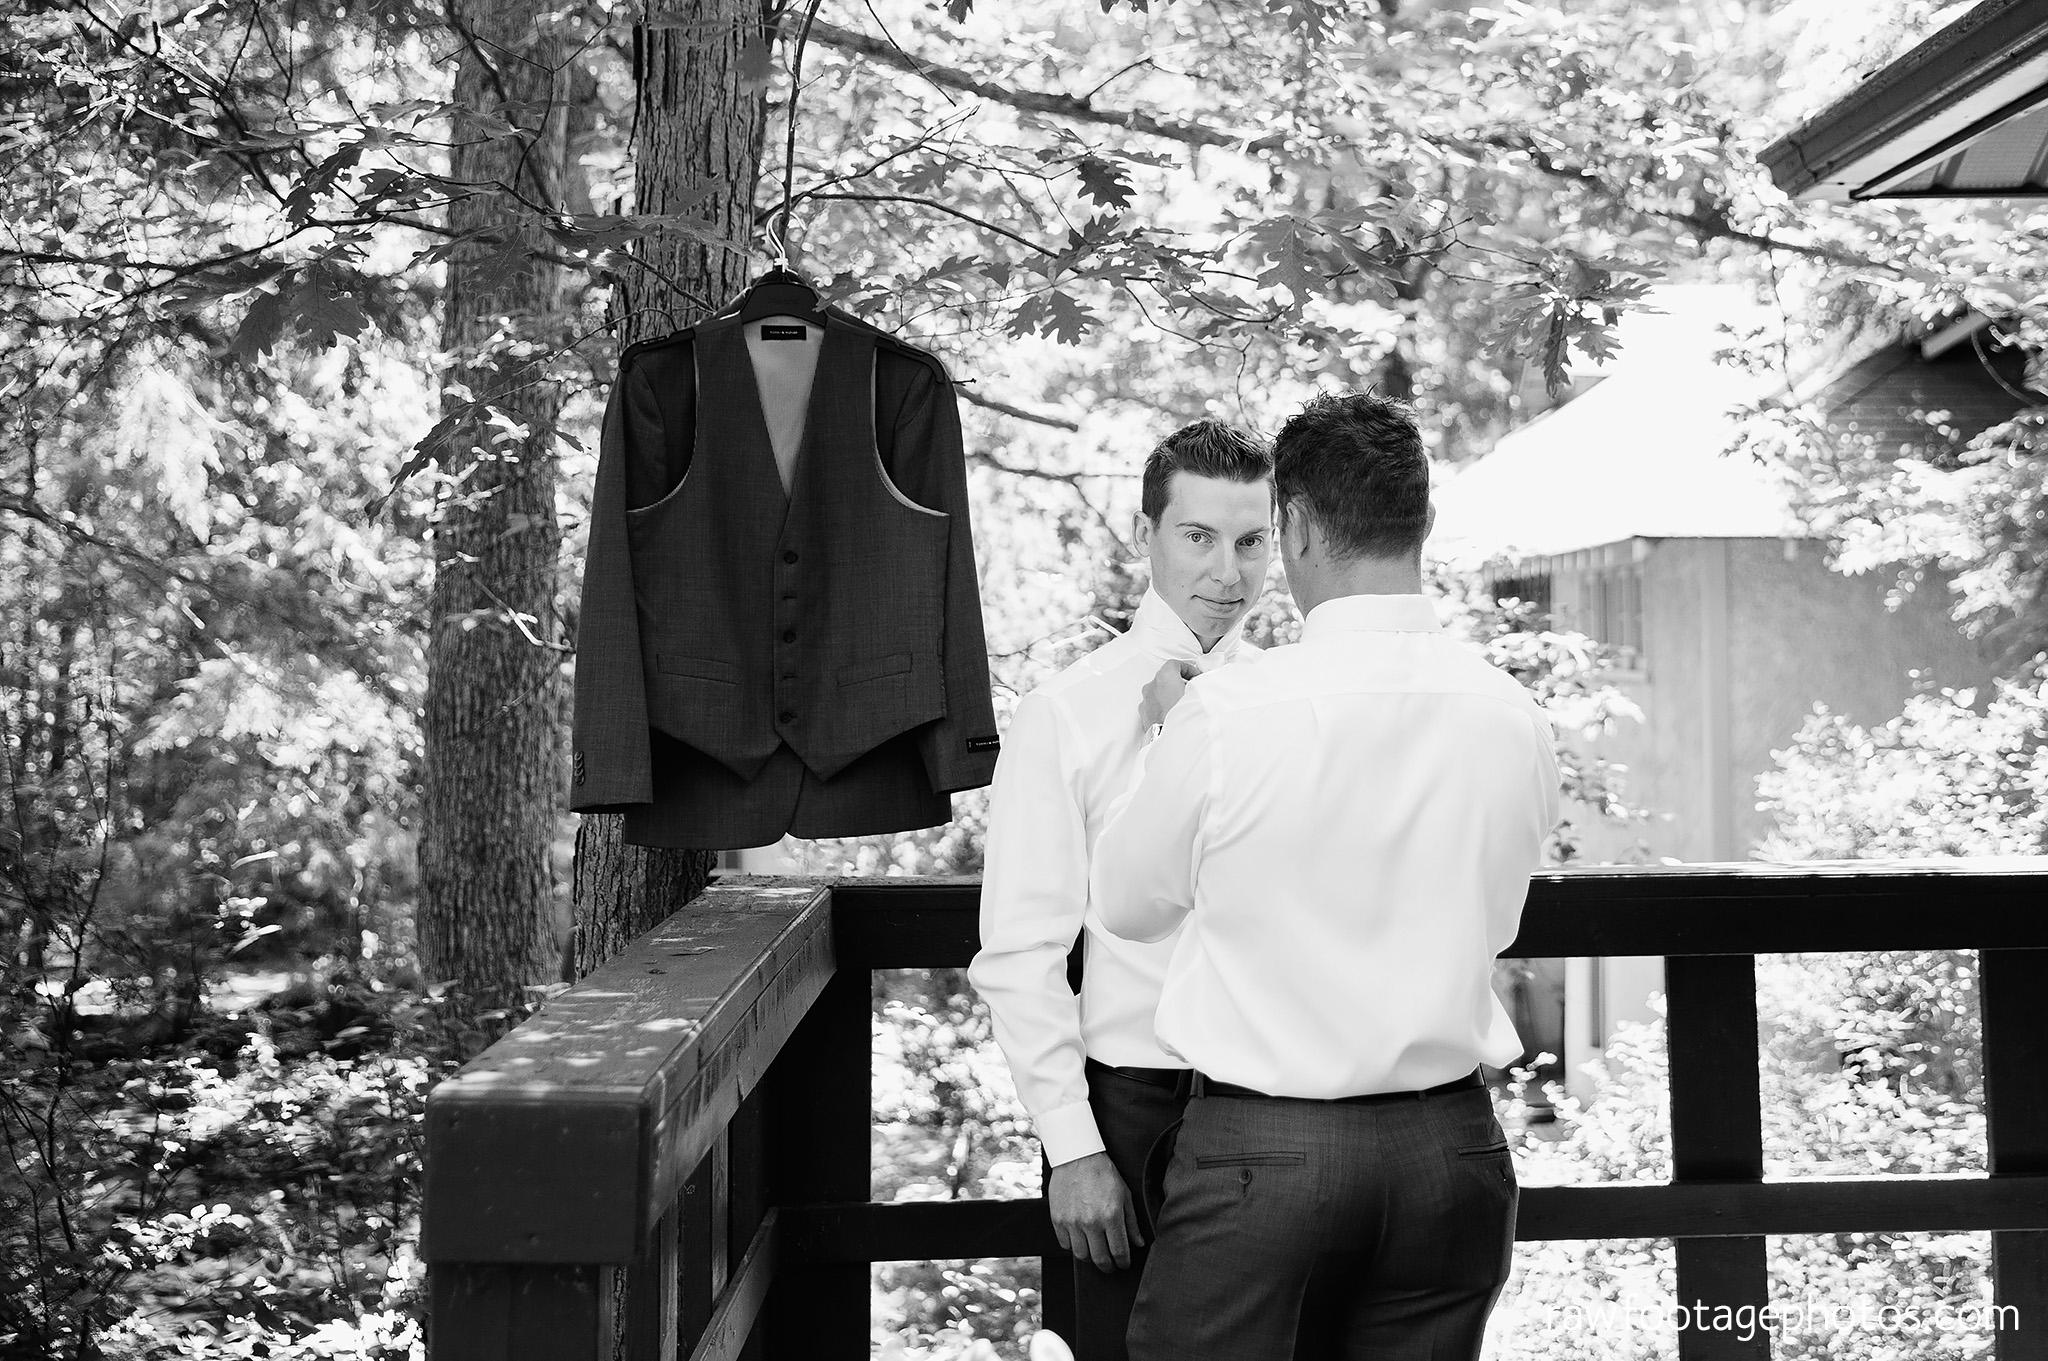 london_ontario_wedding_photographer-grand_bend_wedding_photographer-oakwood_resort_wedding-beach_wedding-sunset_wedding-raw_footage_photography006.jpg